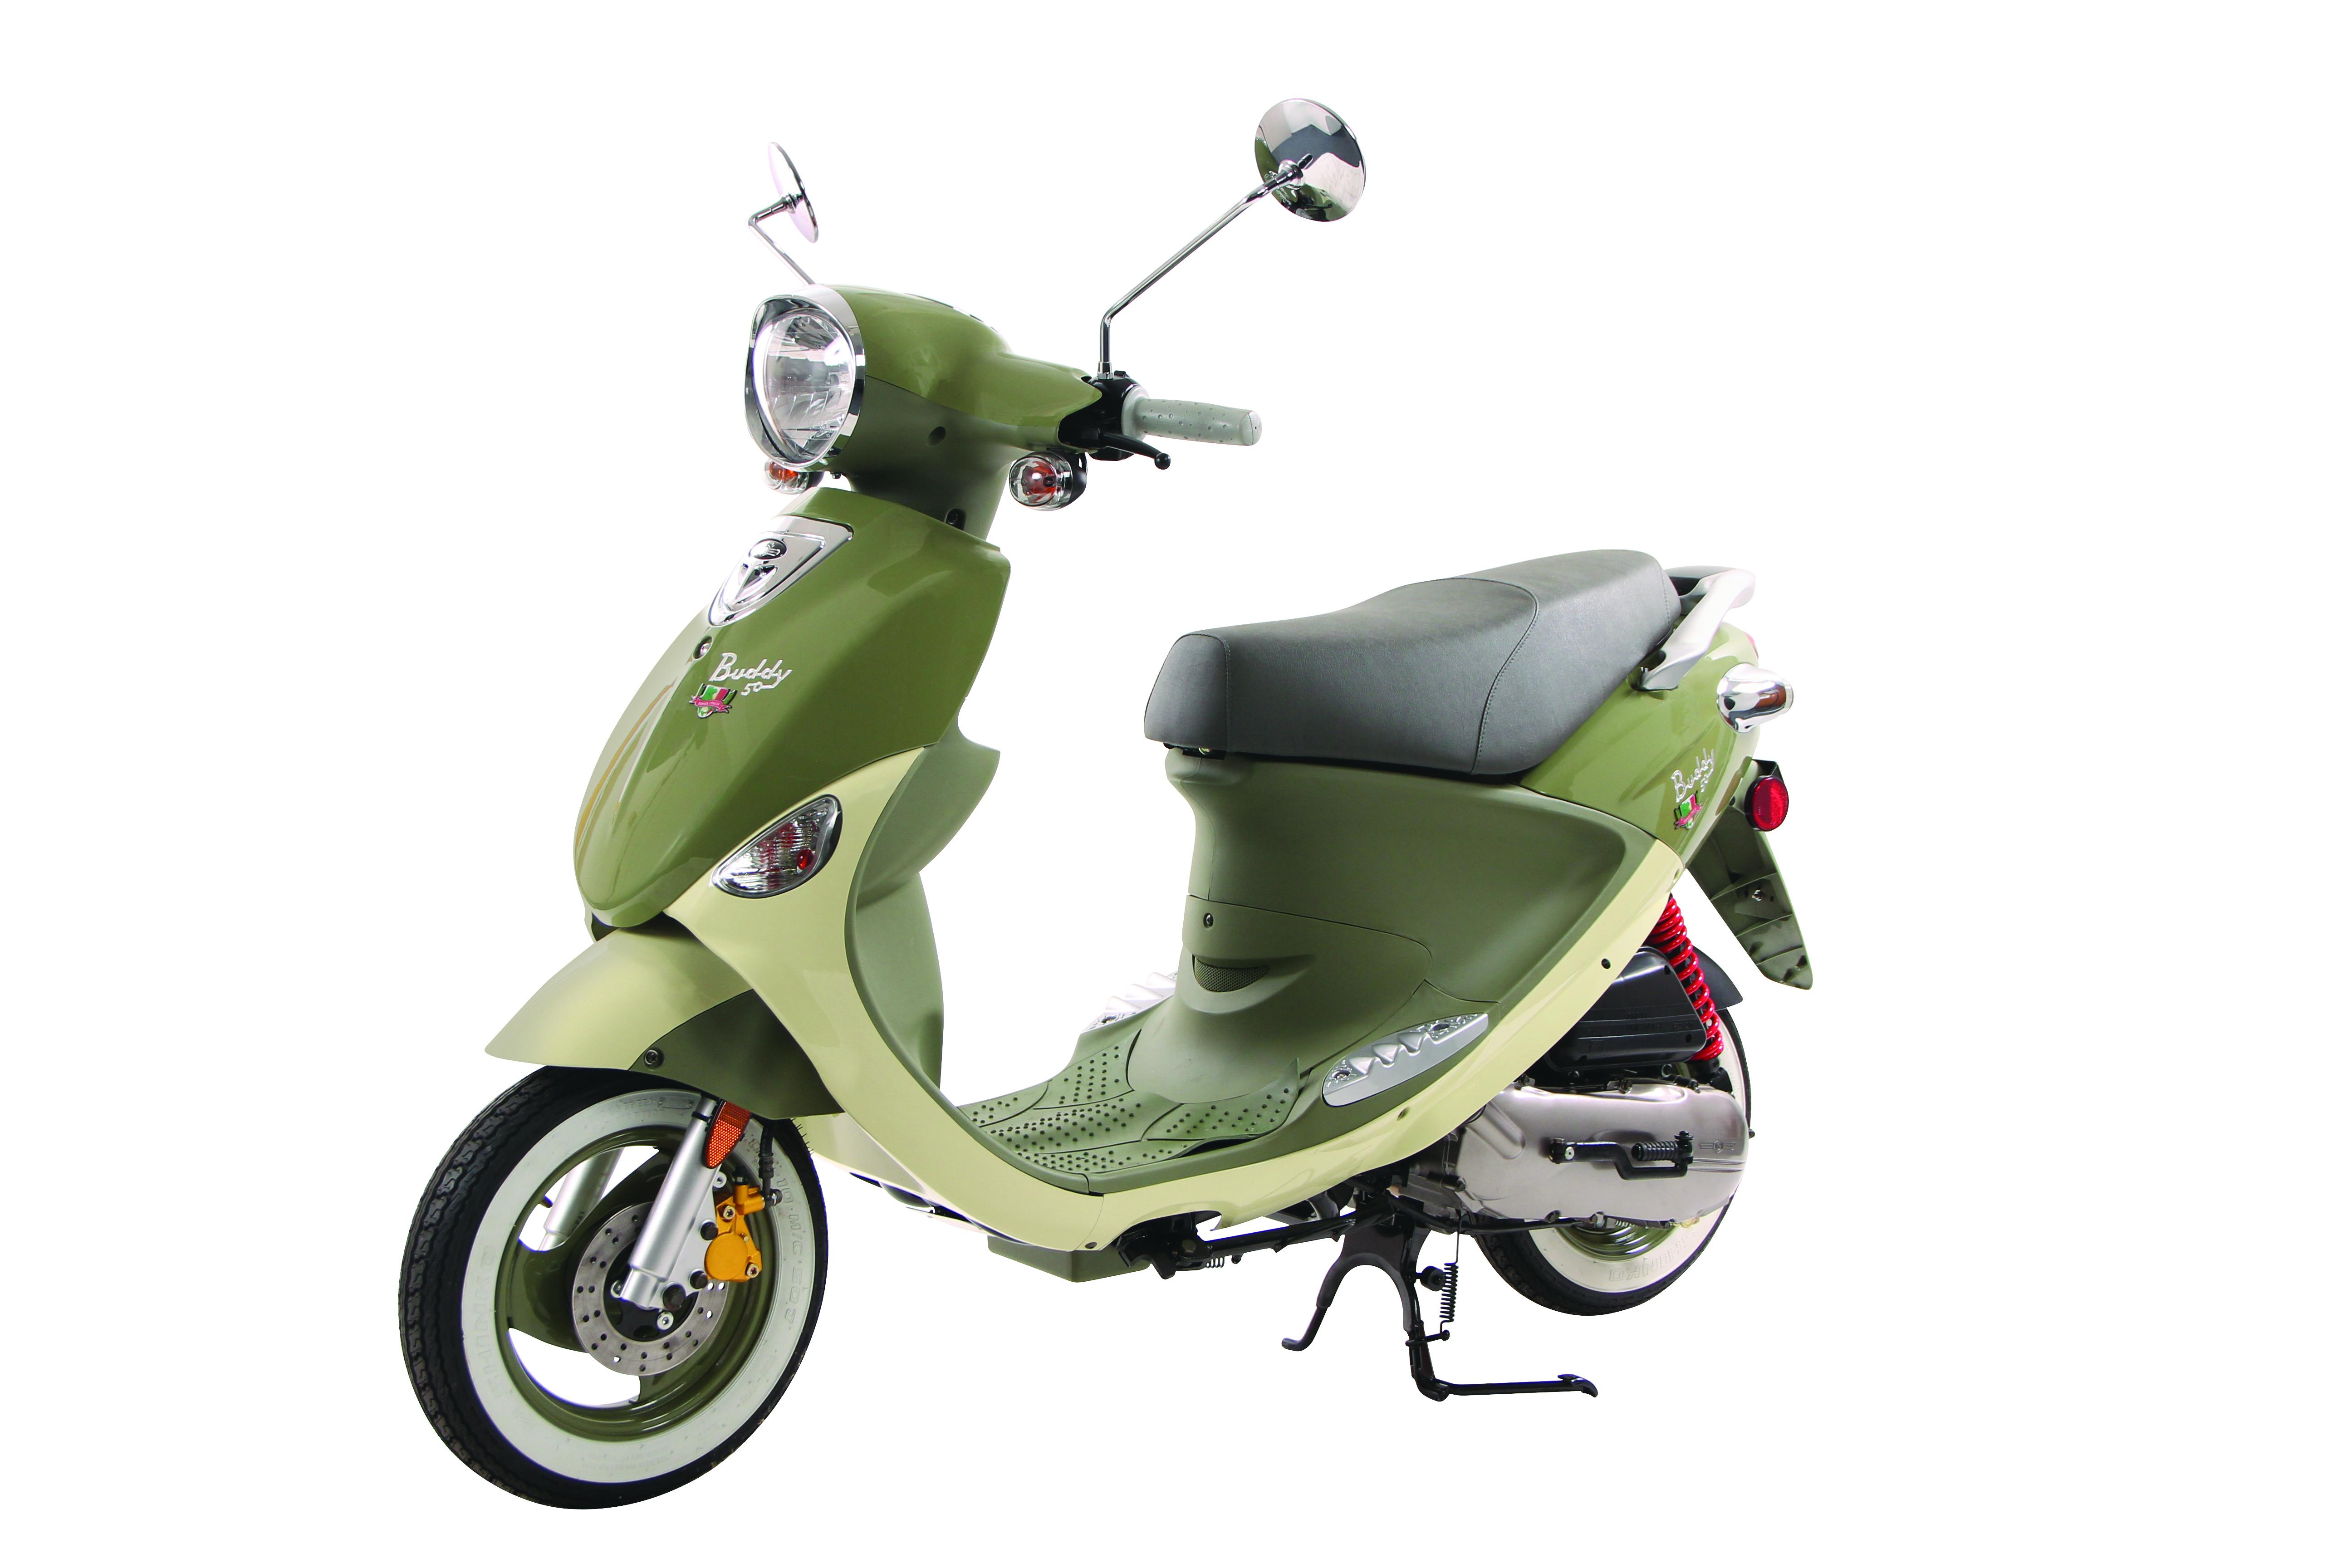 Italia Green Genuine Buddy 50 International